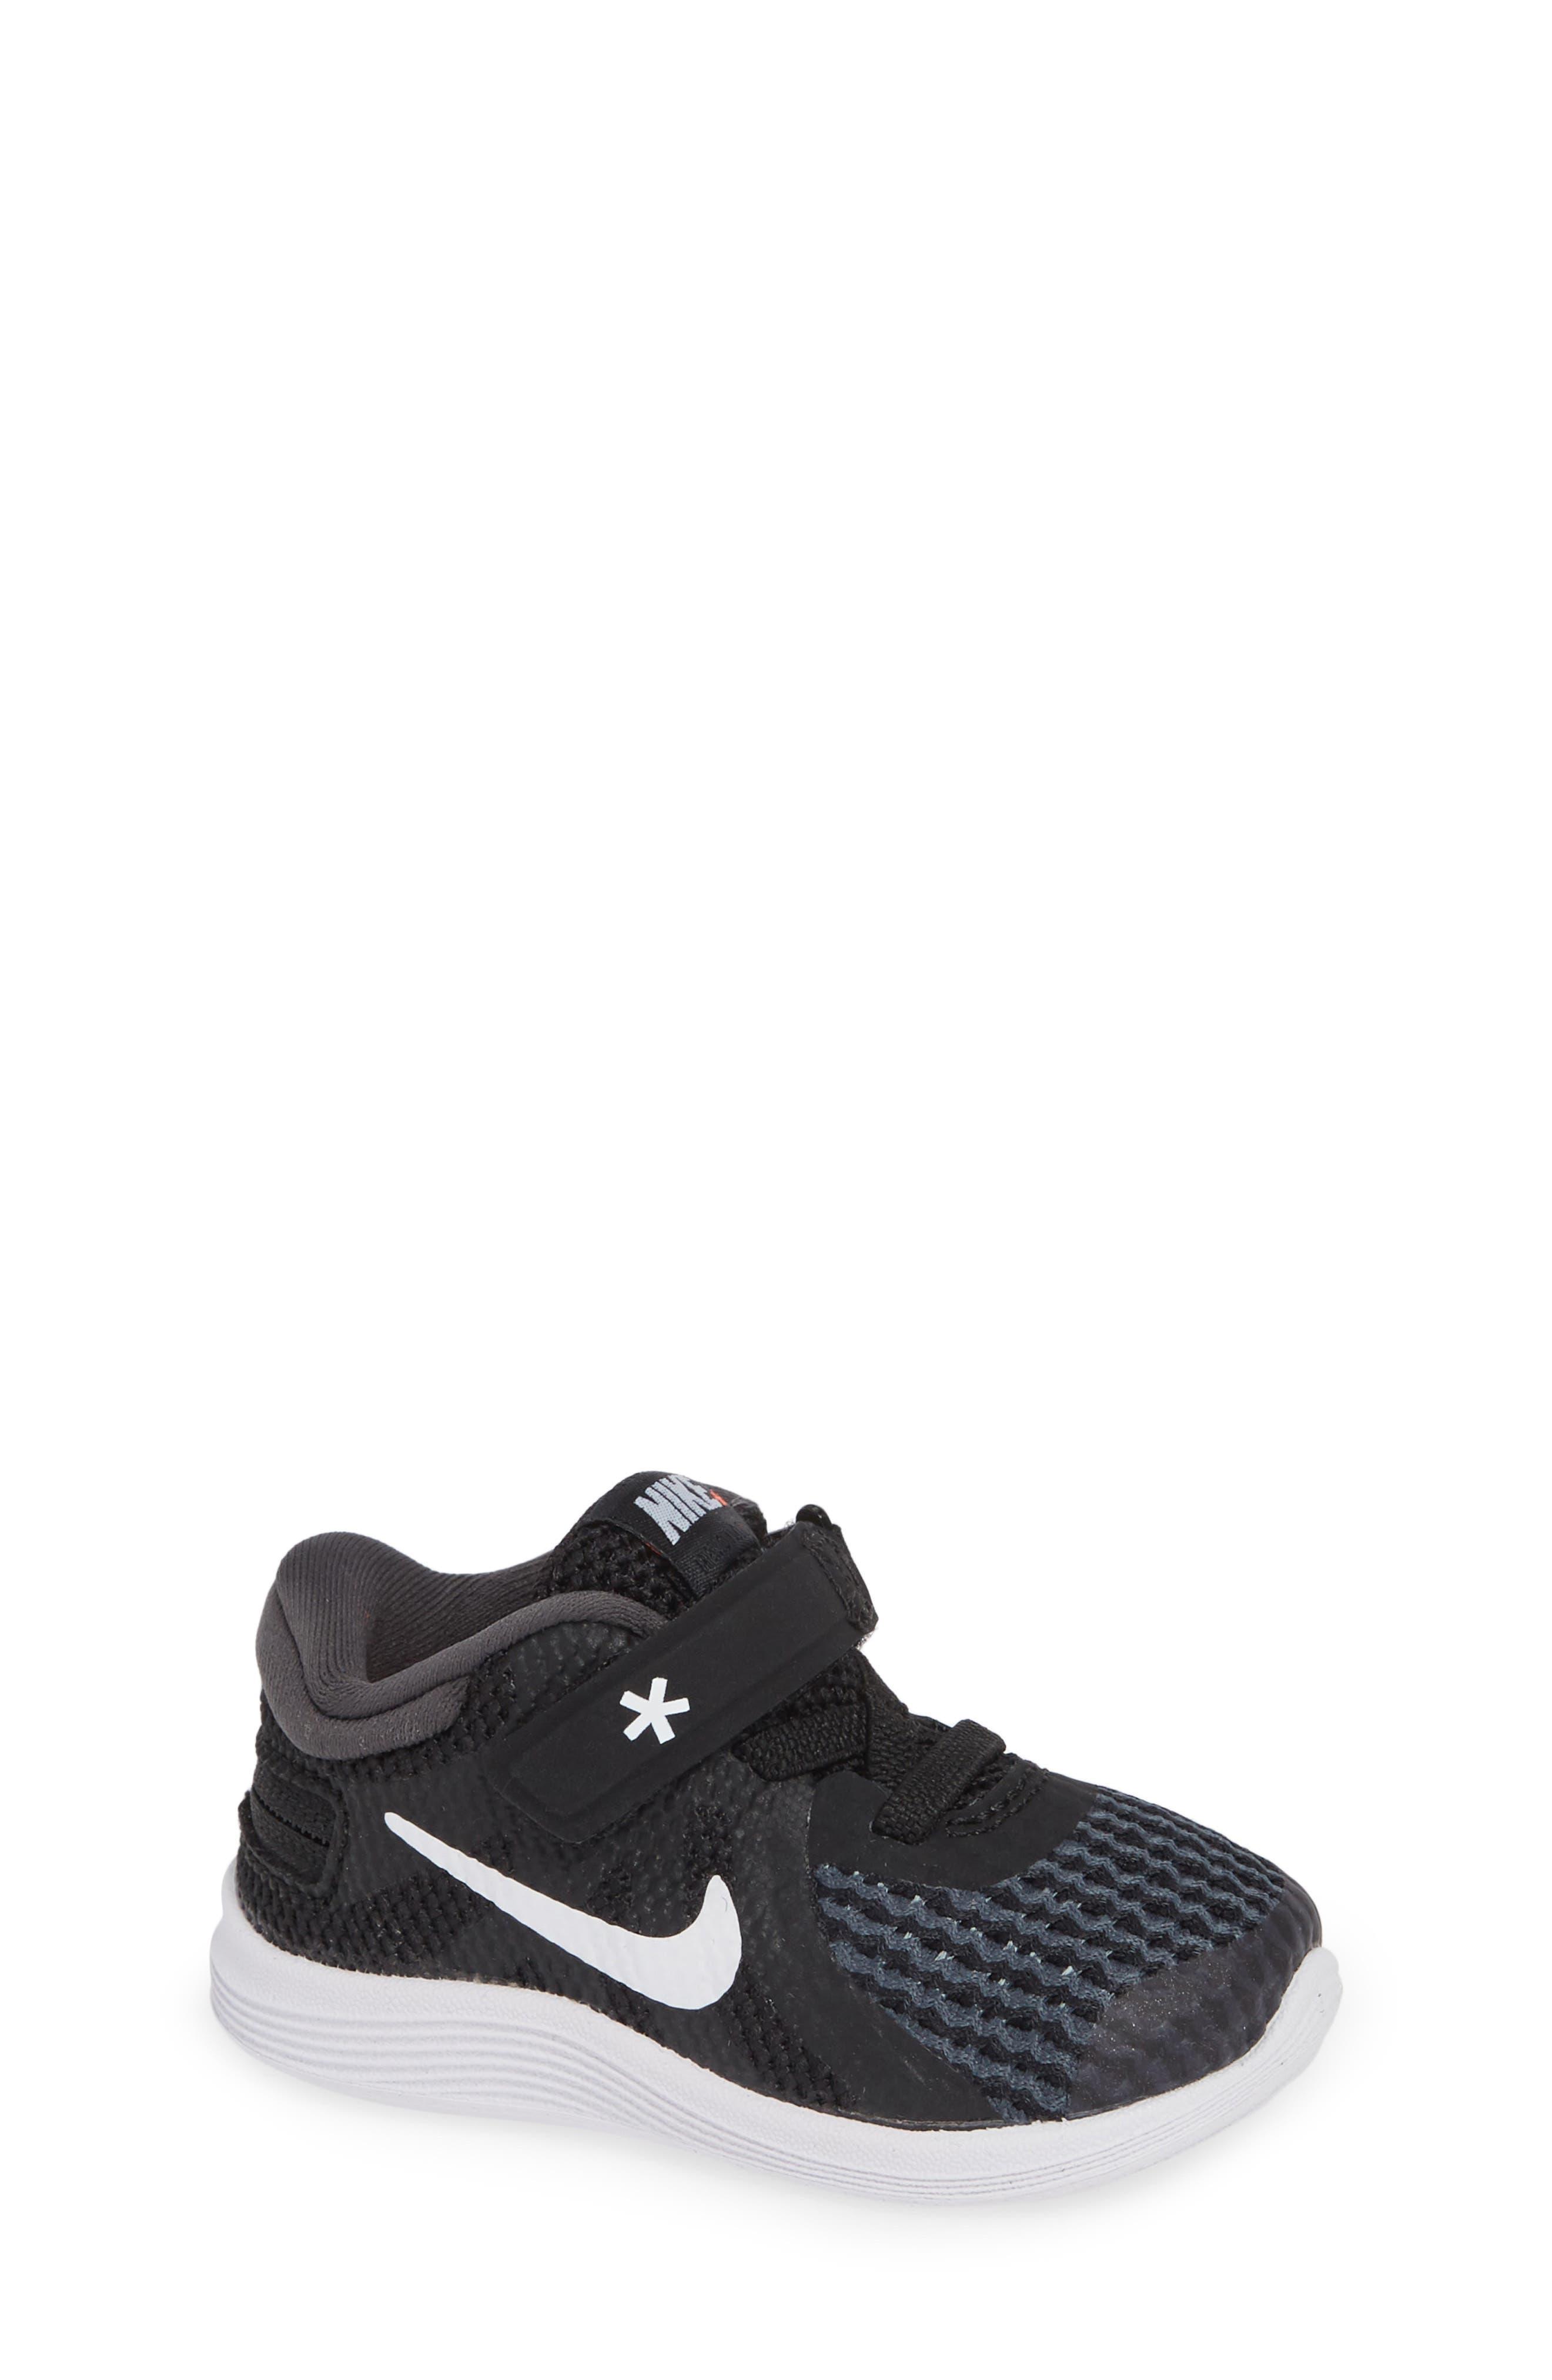 NIKE Revolution 4 Flyease Sneaker, Main, color, BLACK TOTAL CRIMSON